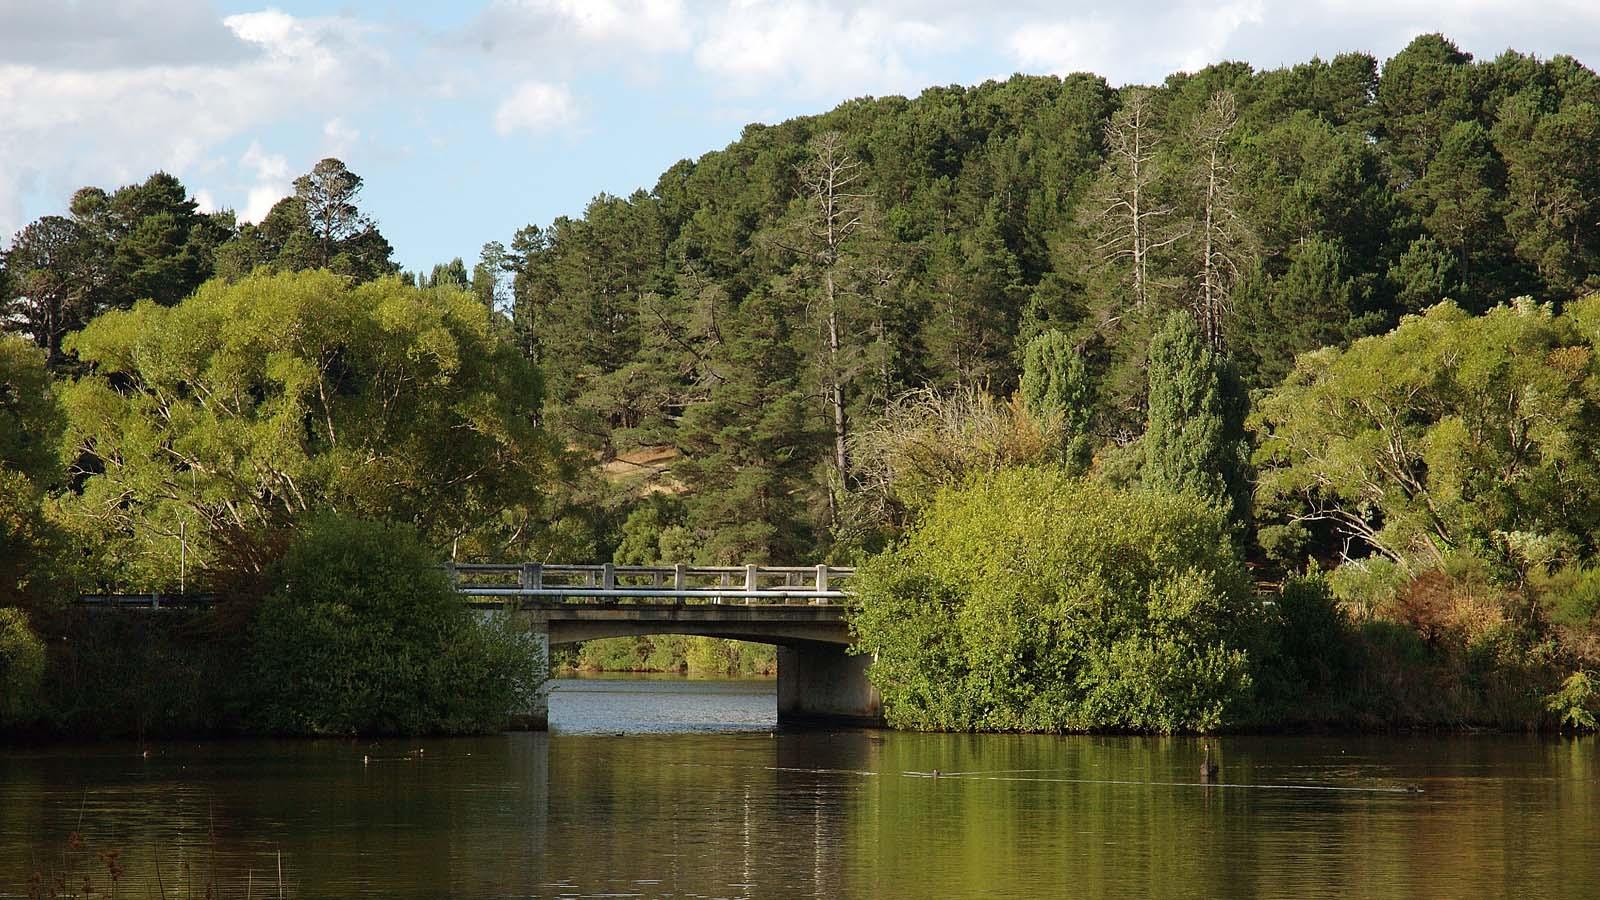 Lake Daylesford, Daylesford and the Macedon Ranges, Victoria, Australia